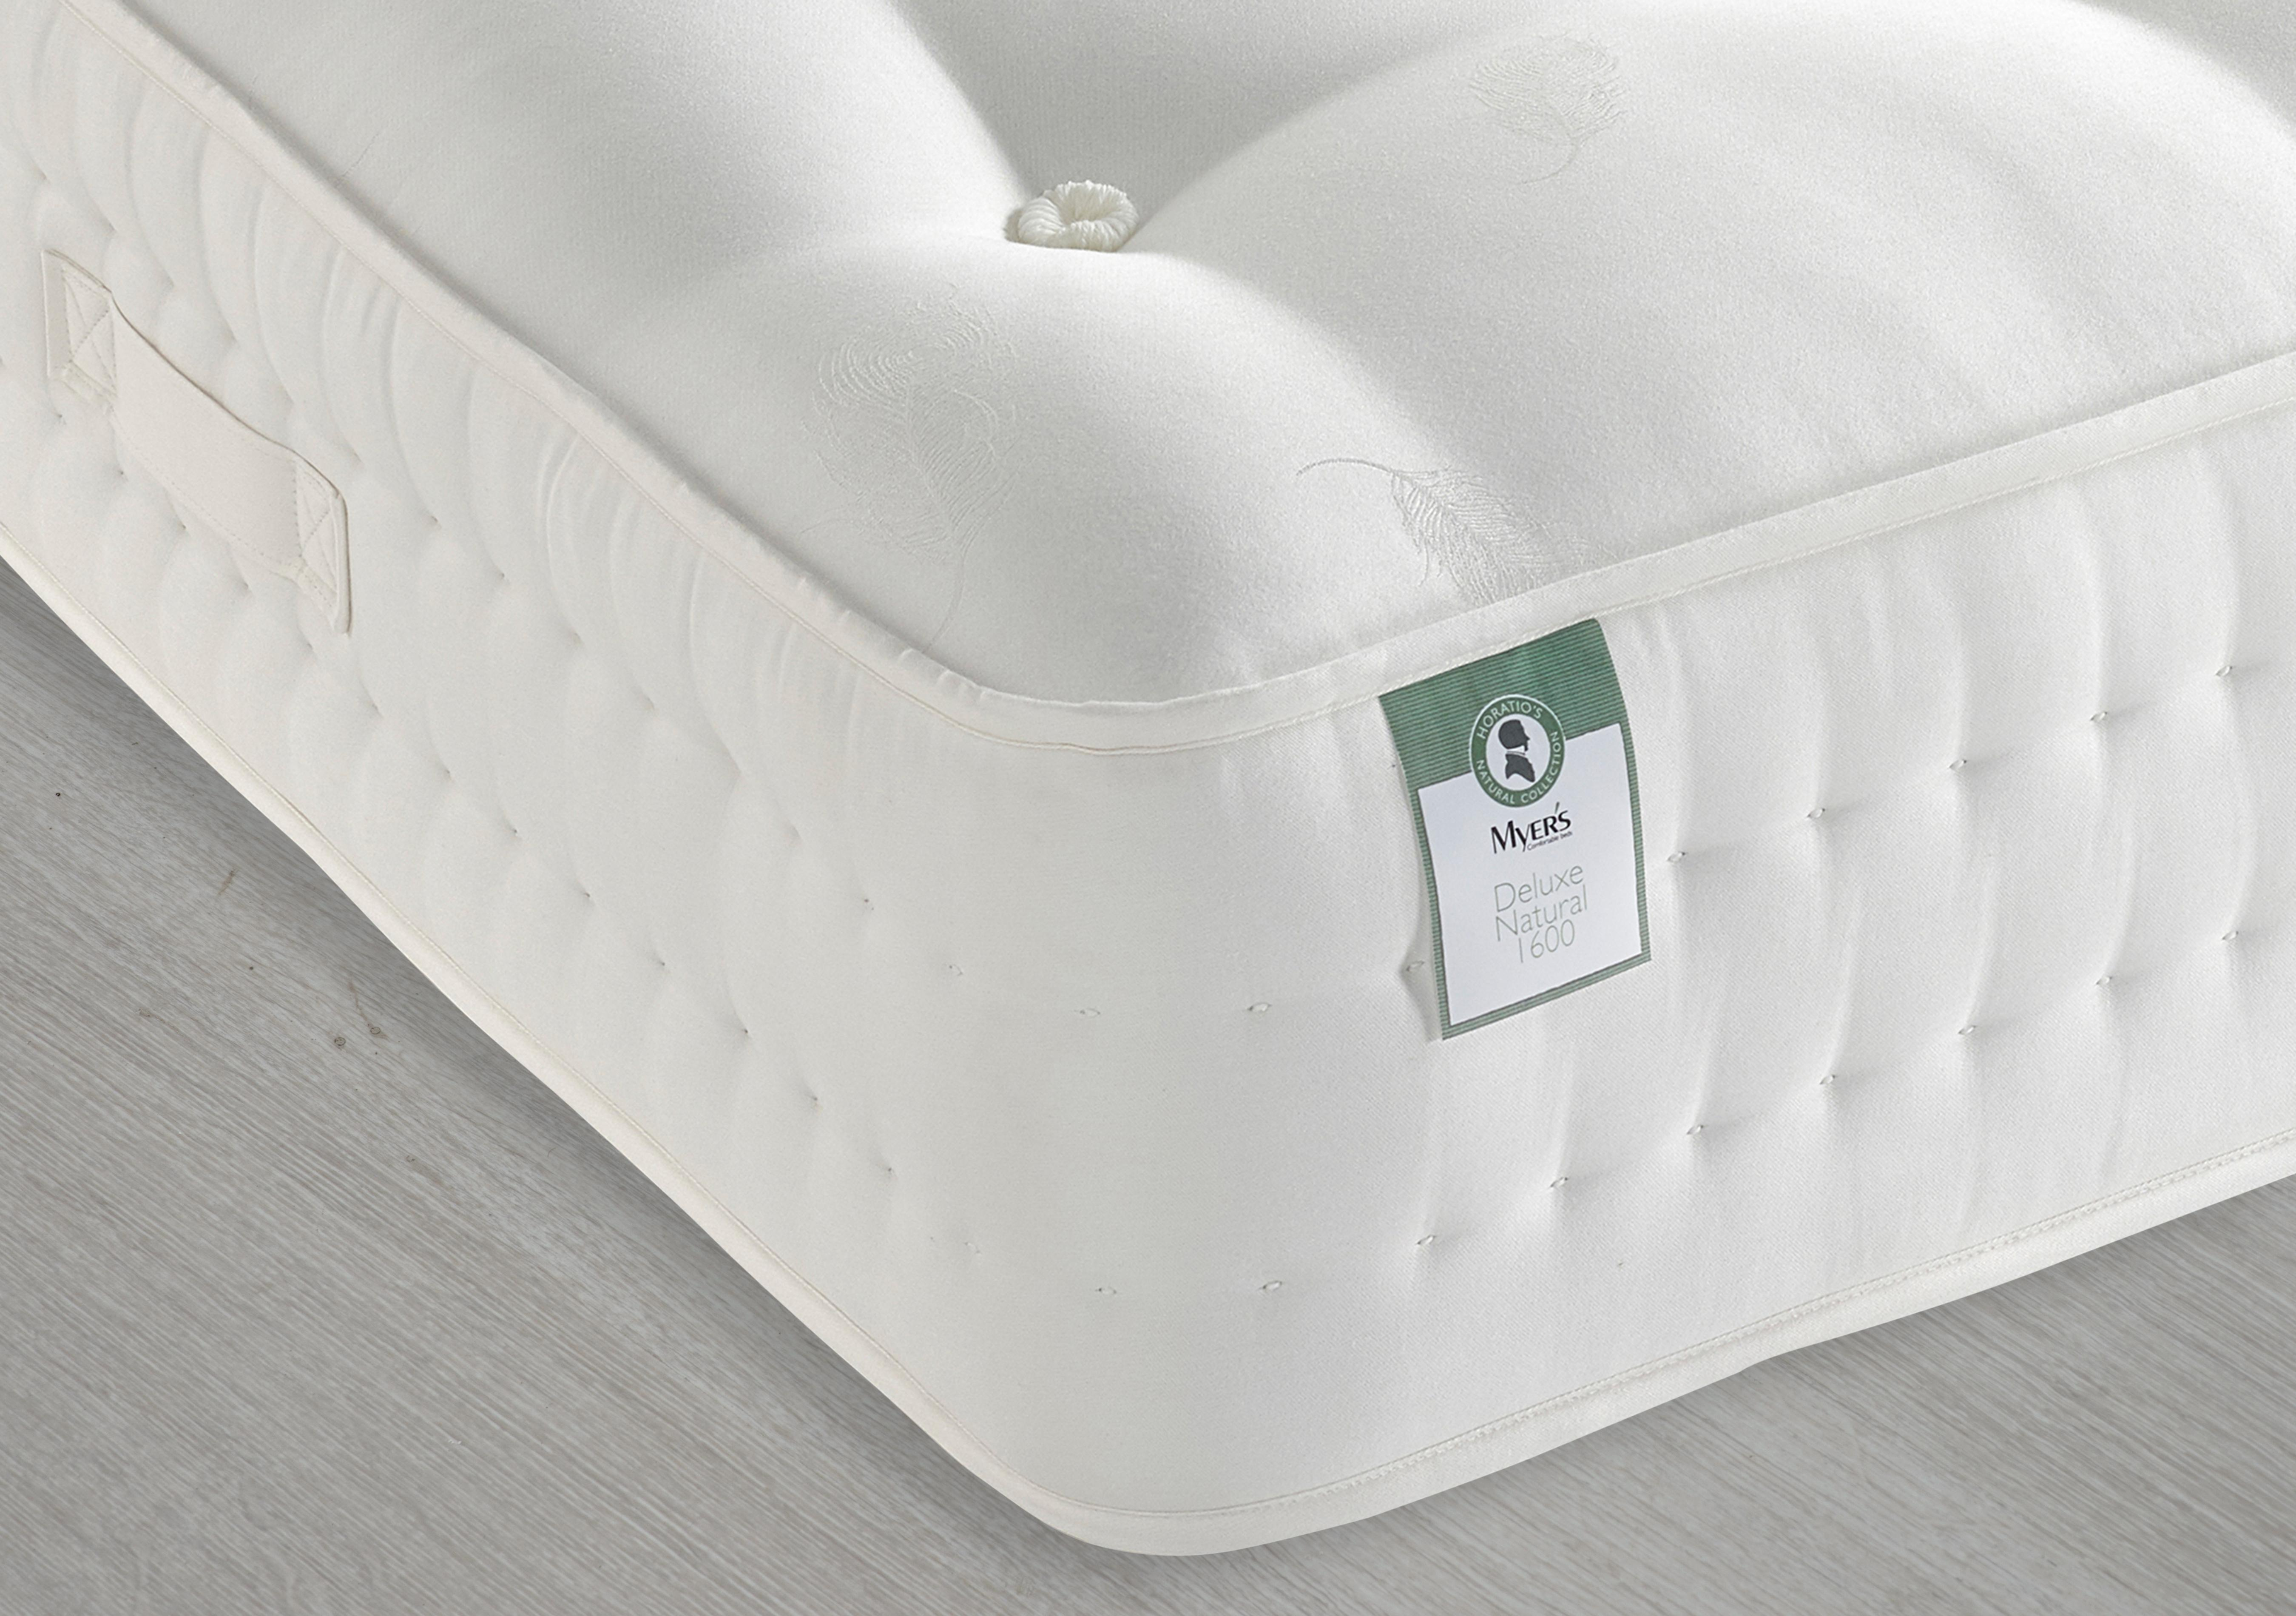 king size mattress. Save £300 King Size Mattress